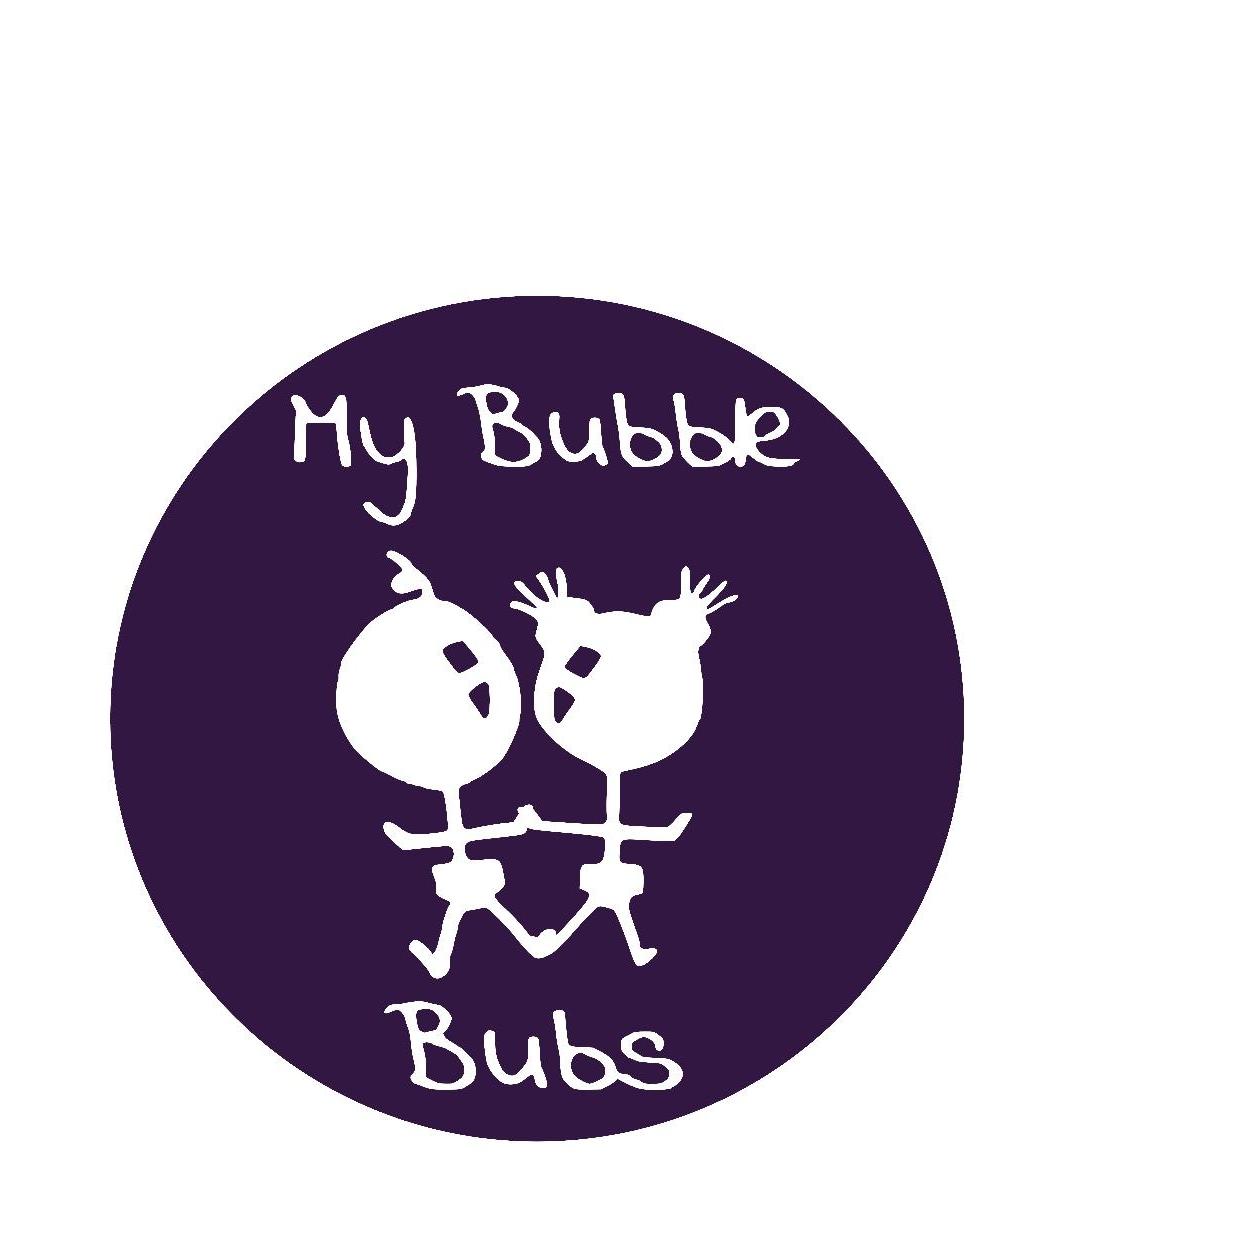 My Bubble Bubs's logo